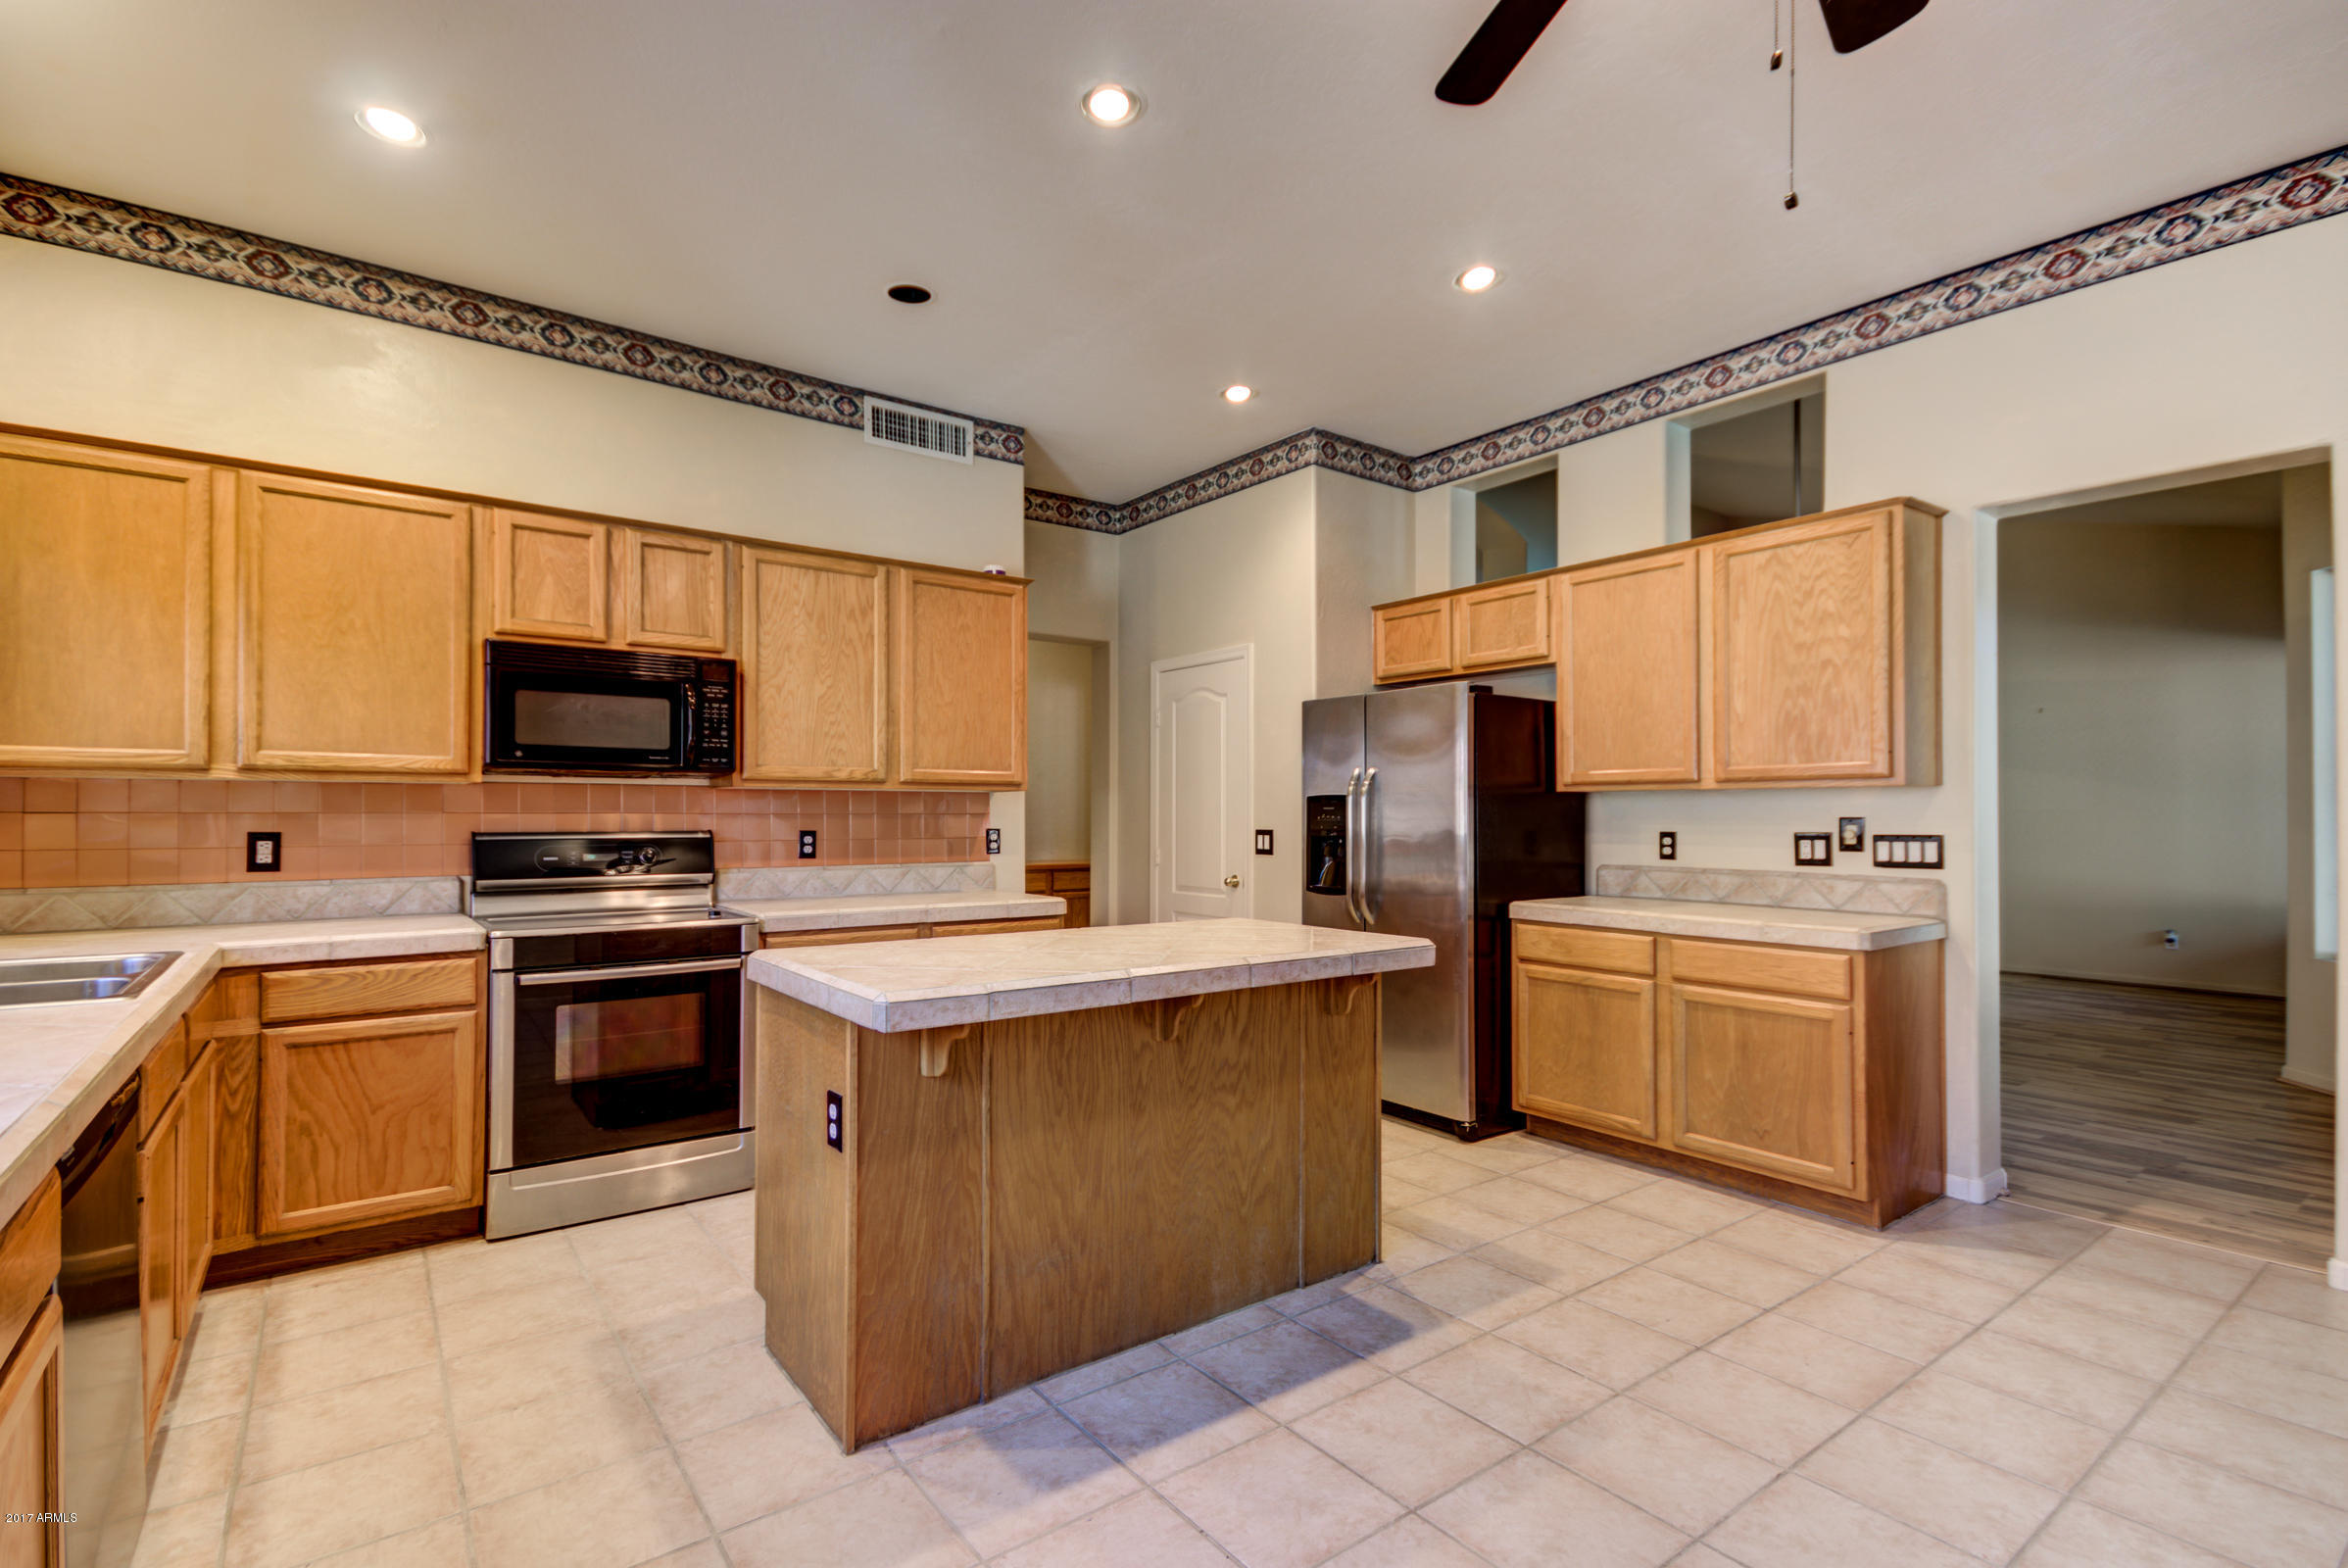 304 S Ironwood  Street Gilbert, AZ 85296 - img14